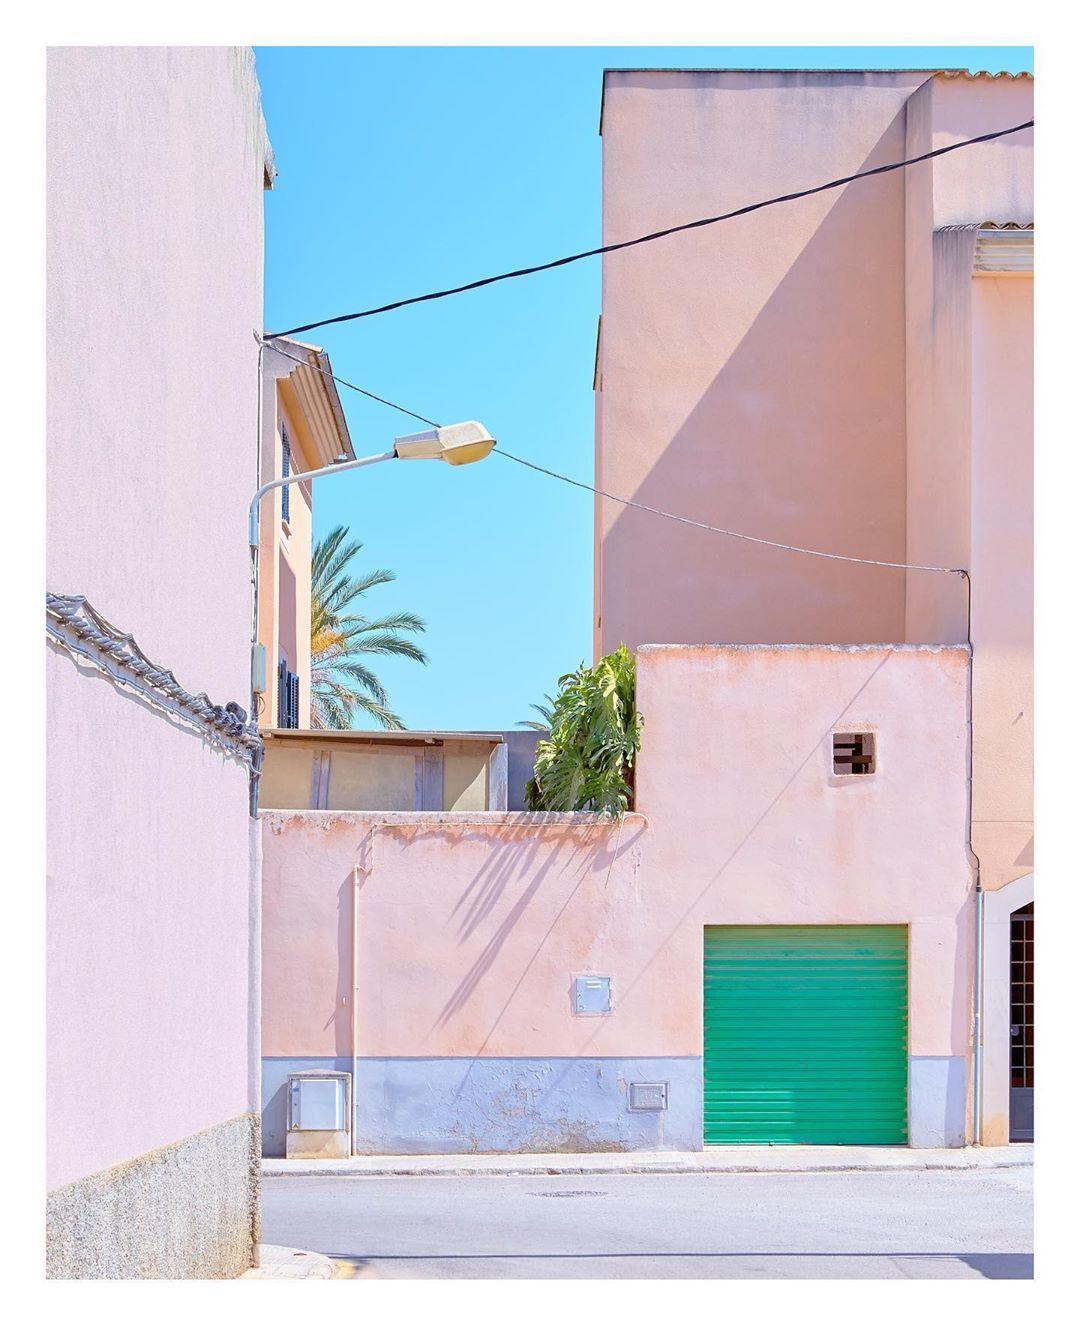 "James Needham on Instagram: ""... . . #somewheremagazine #dreamermagazine #apricotmagazine #pellicolamag #schonmagazine #saturdaysmag #insomniamag #magnificomagazine…"""